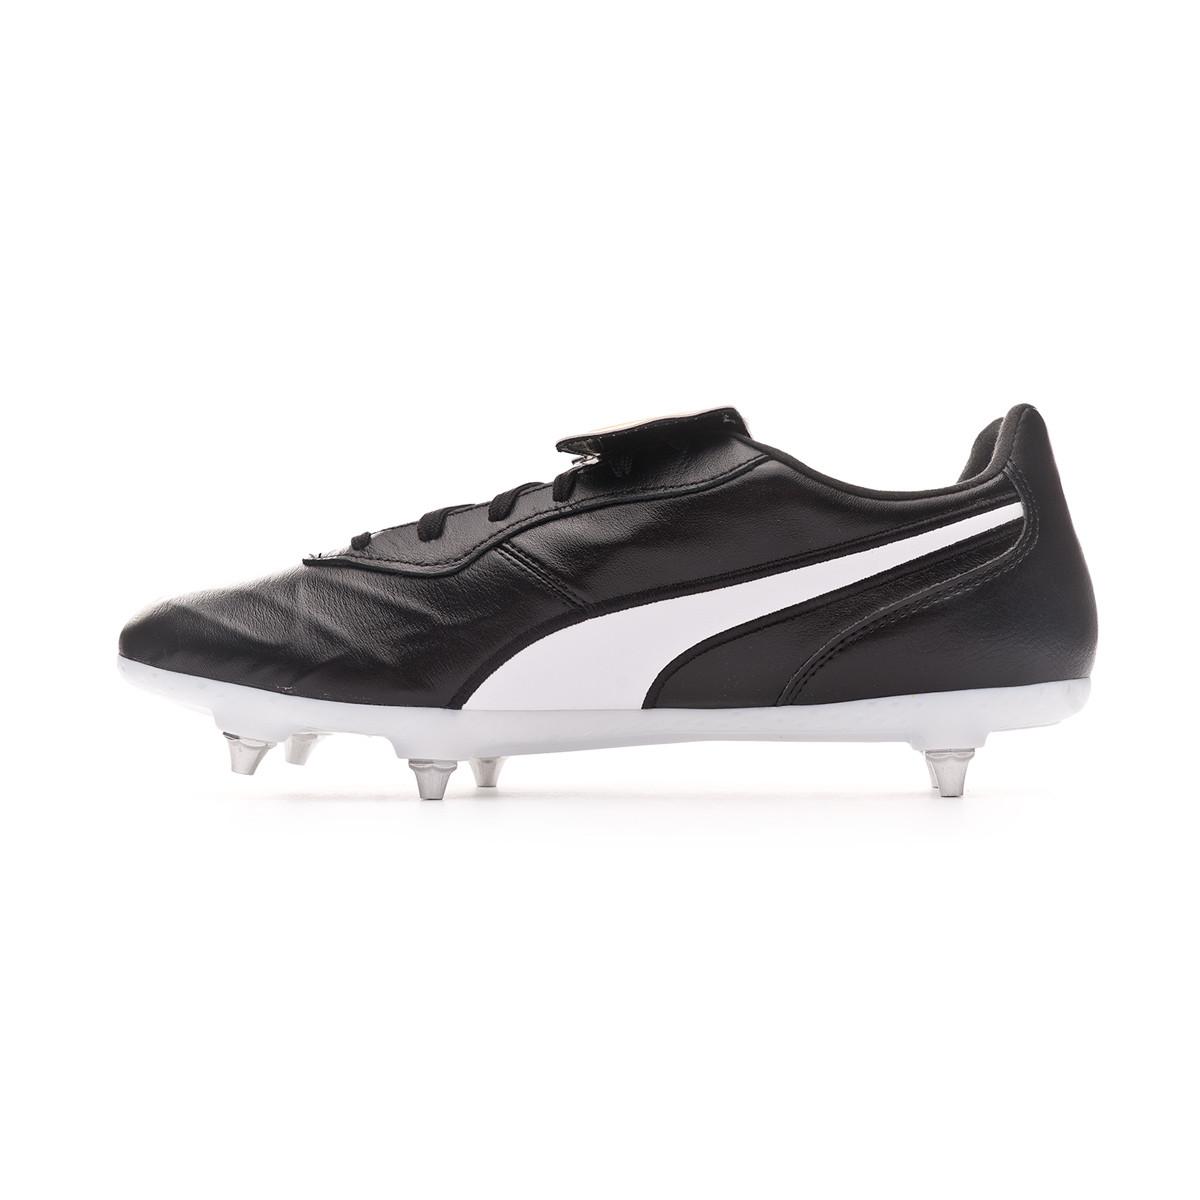 Puma King Top SG Football Boots